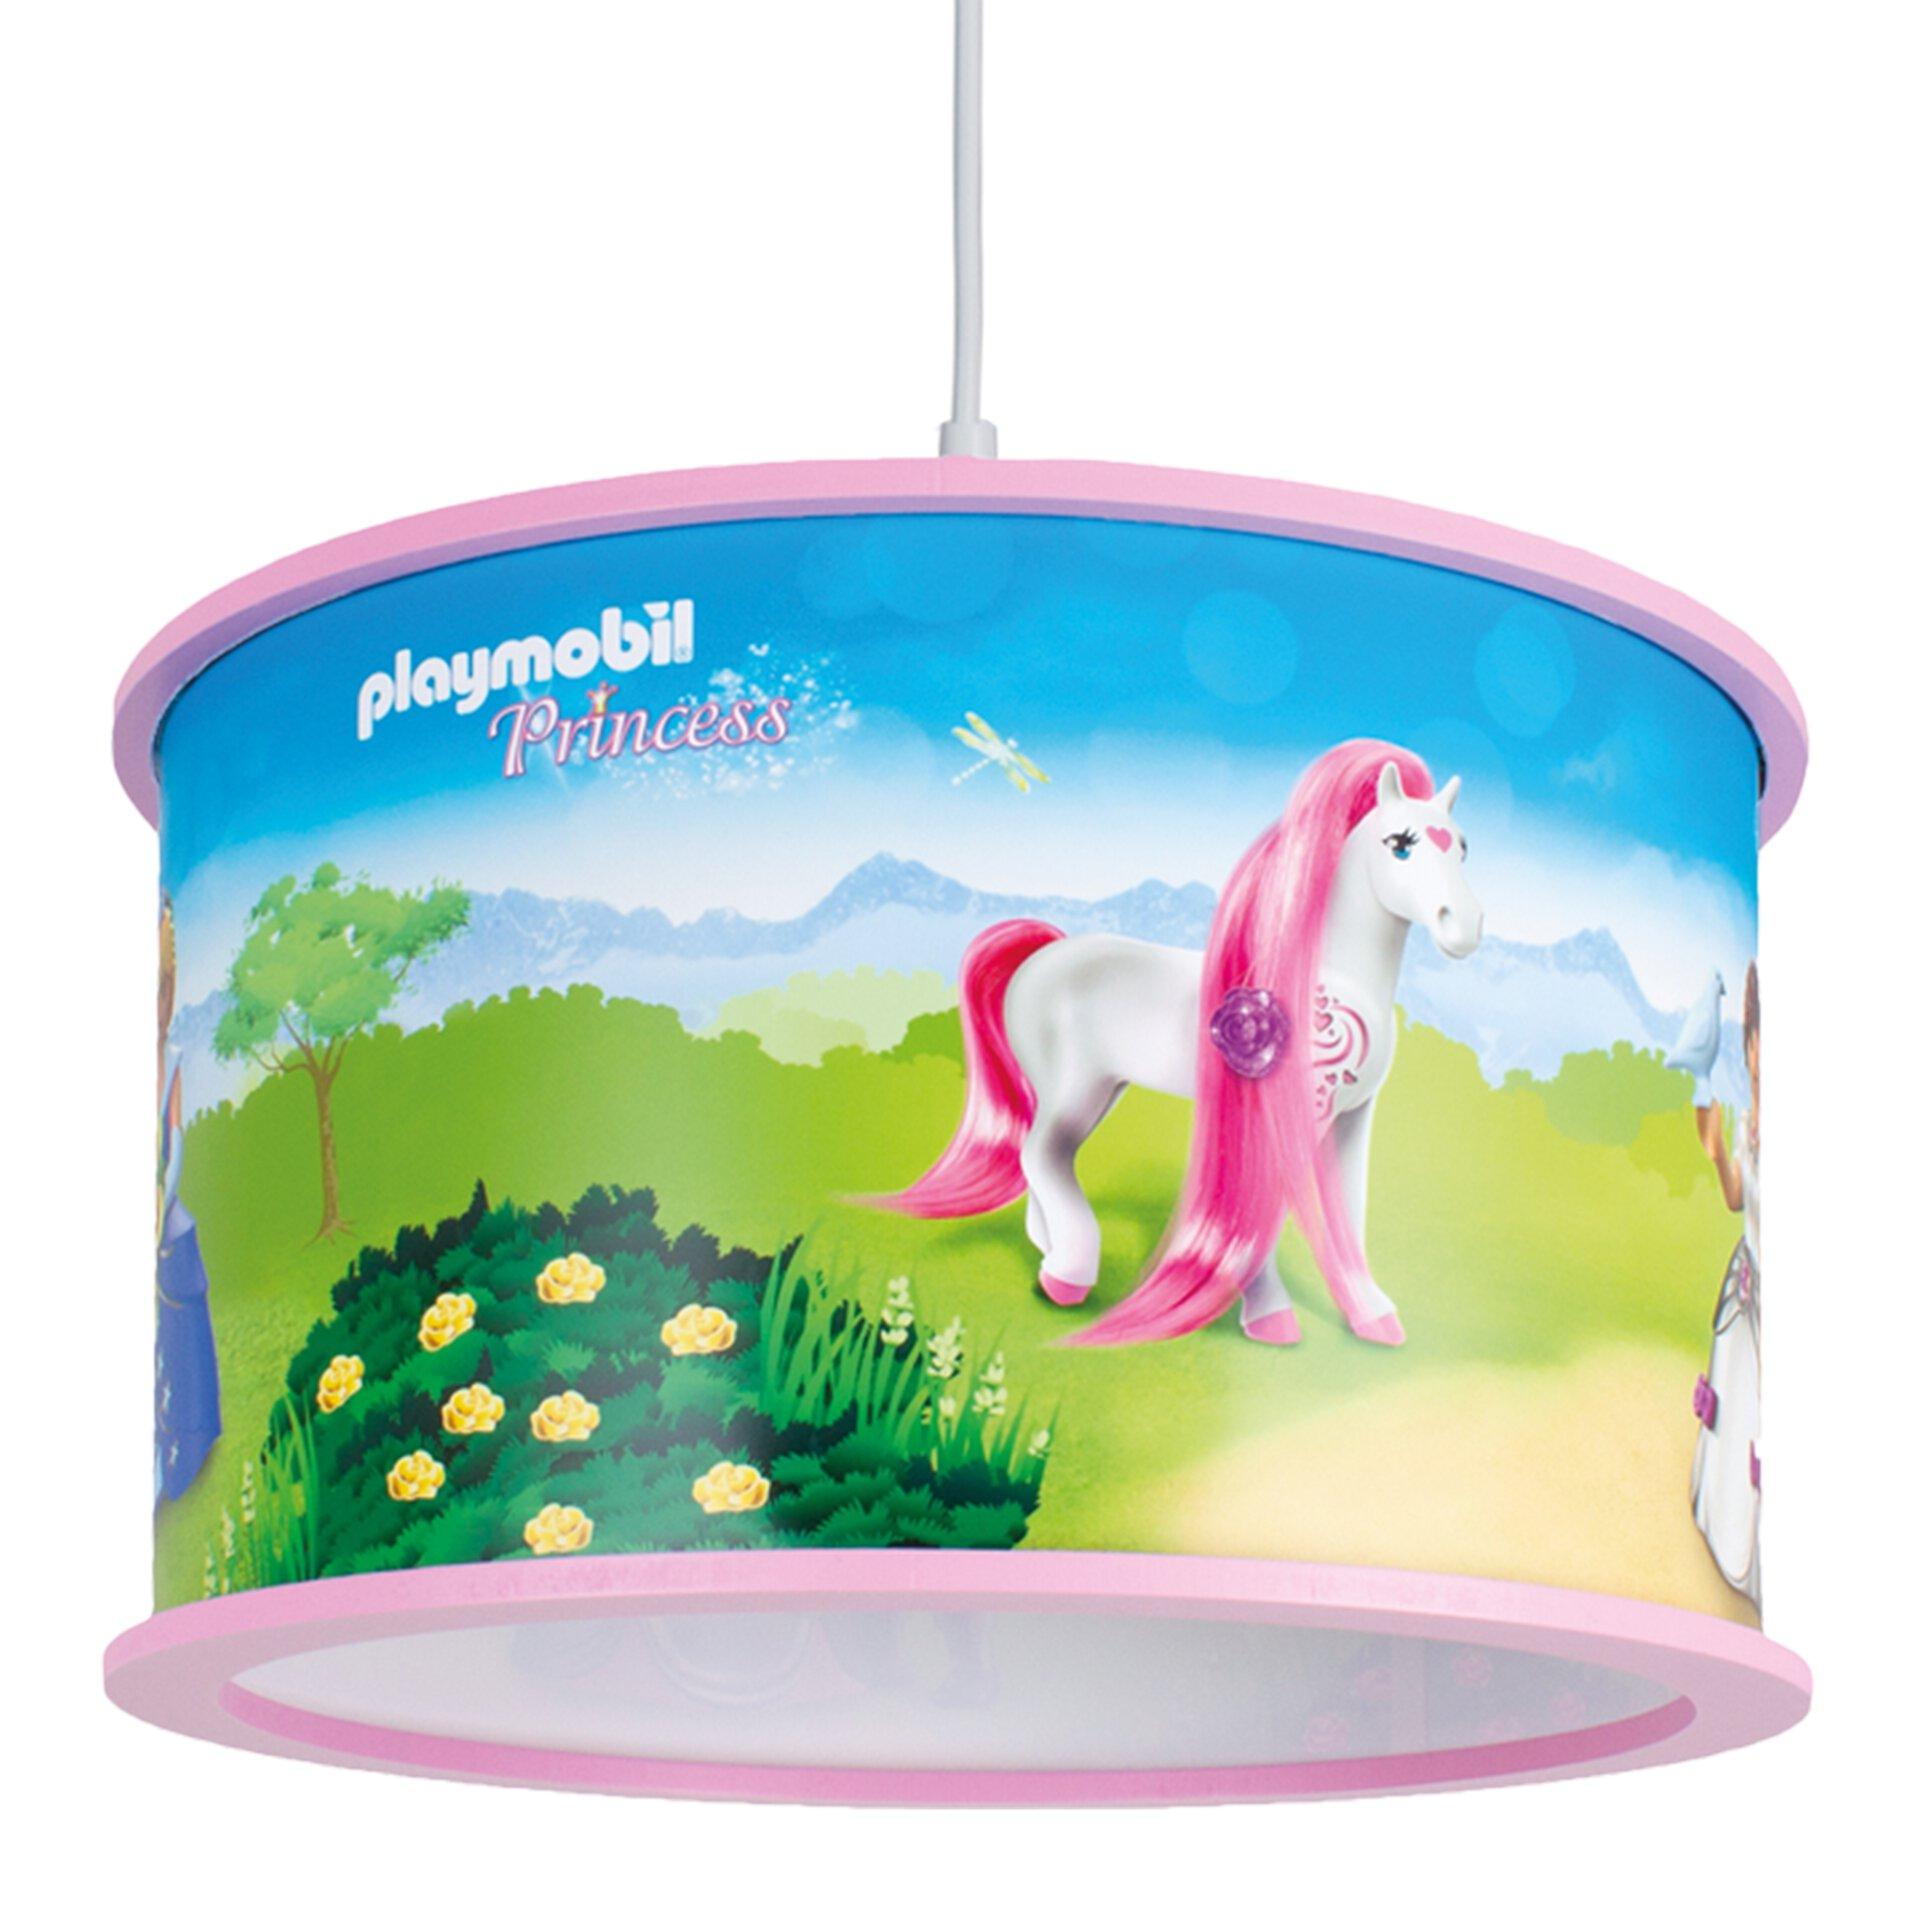 Hängeleuchte Playmobil Princess Elobra Holz mehrfarbig 40 x 25 x 40 cm